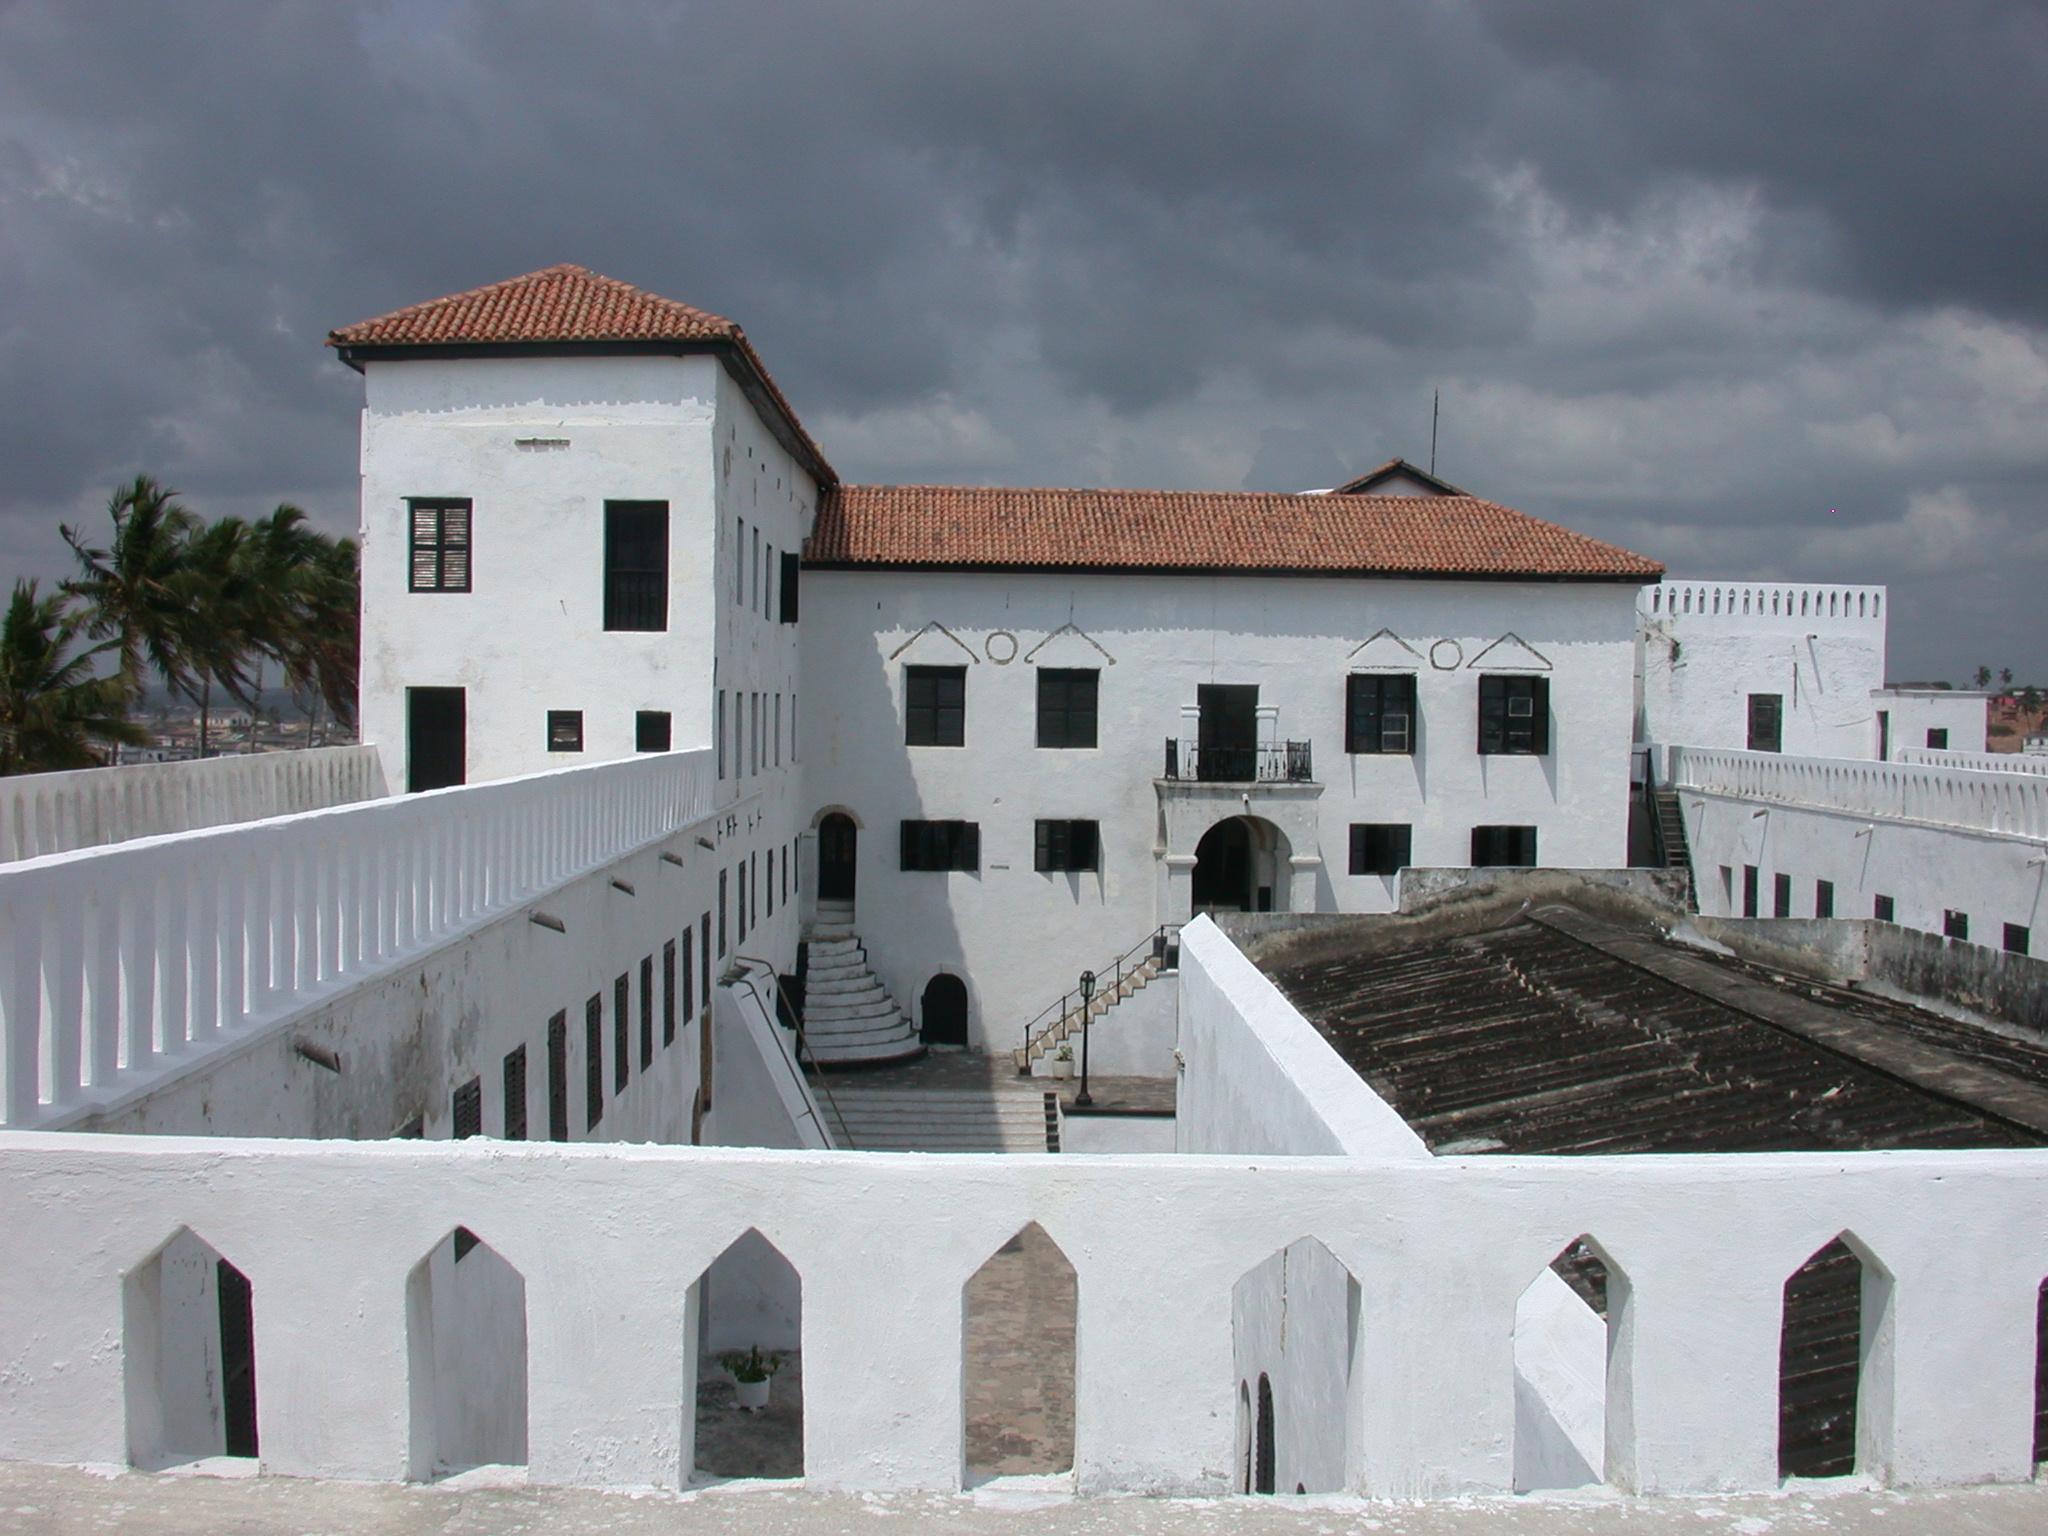 Interior Courtyard View From Upper Level Roof Terrace, Elmina Slave Fort, Elmina, Ghana